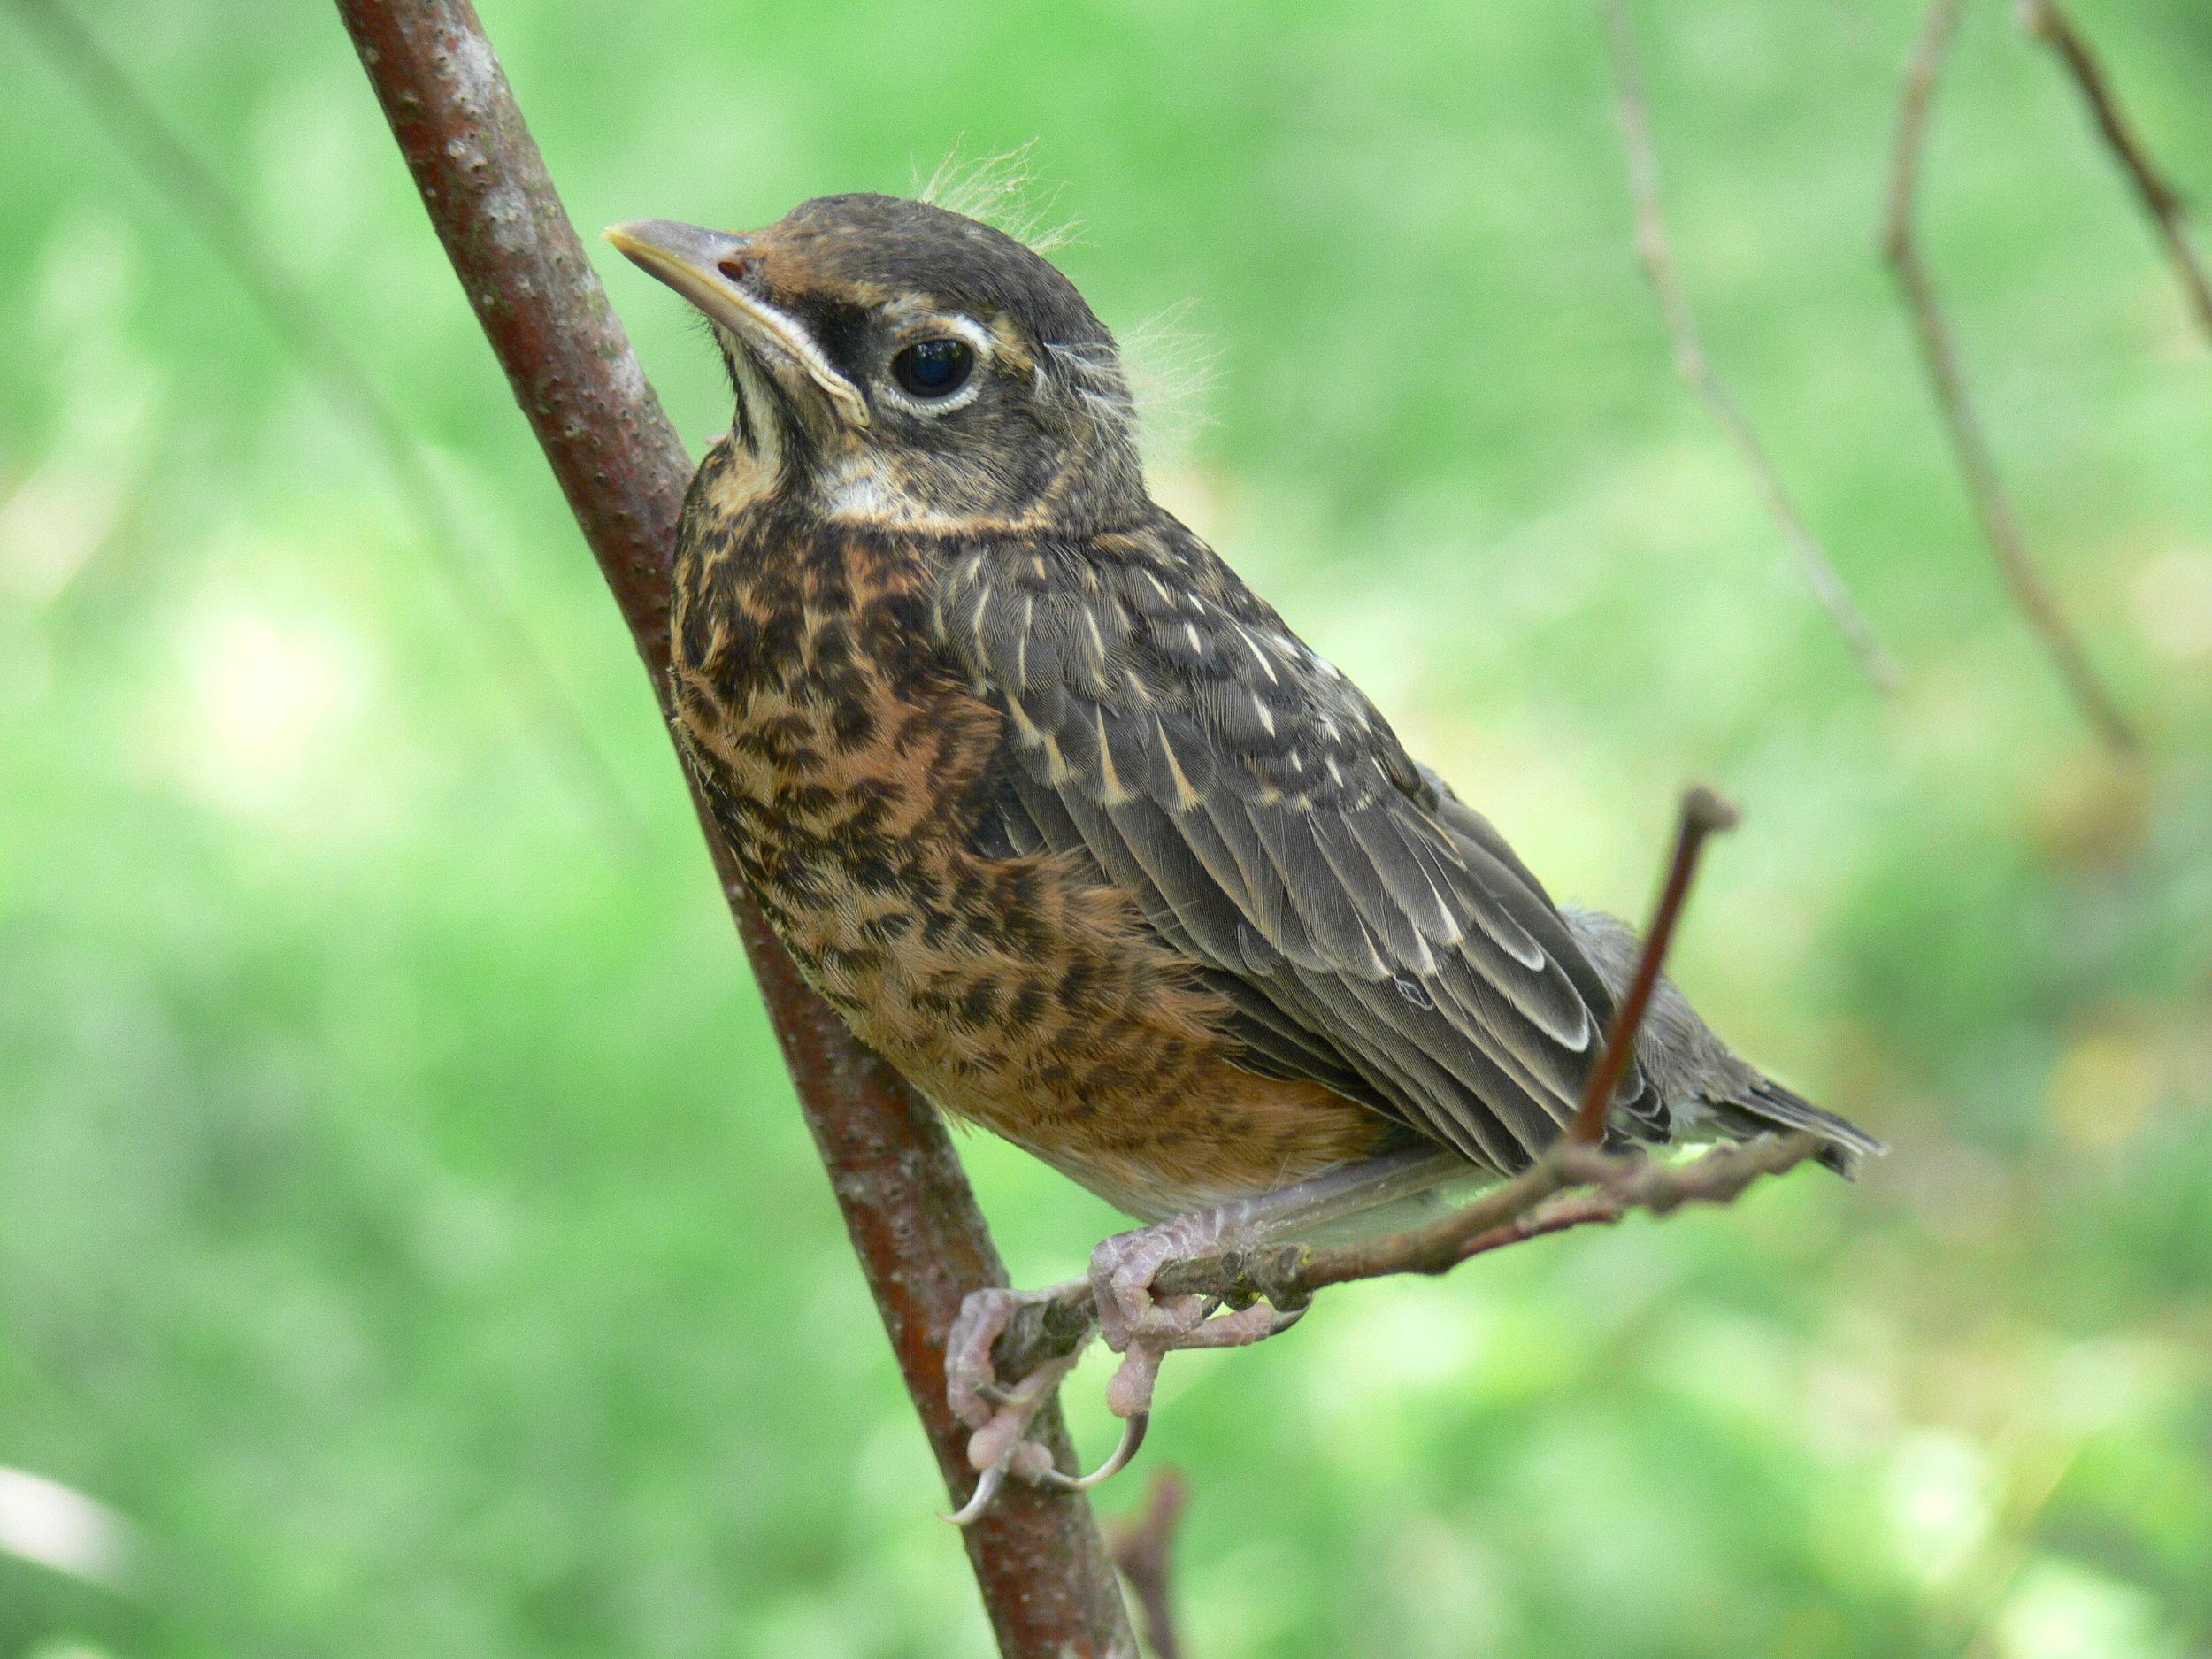 Photo of a baby Robin by Doris May